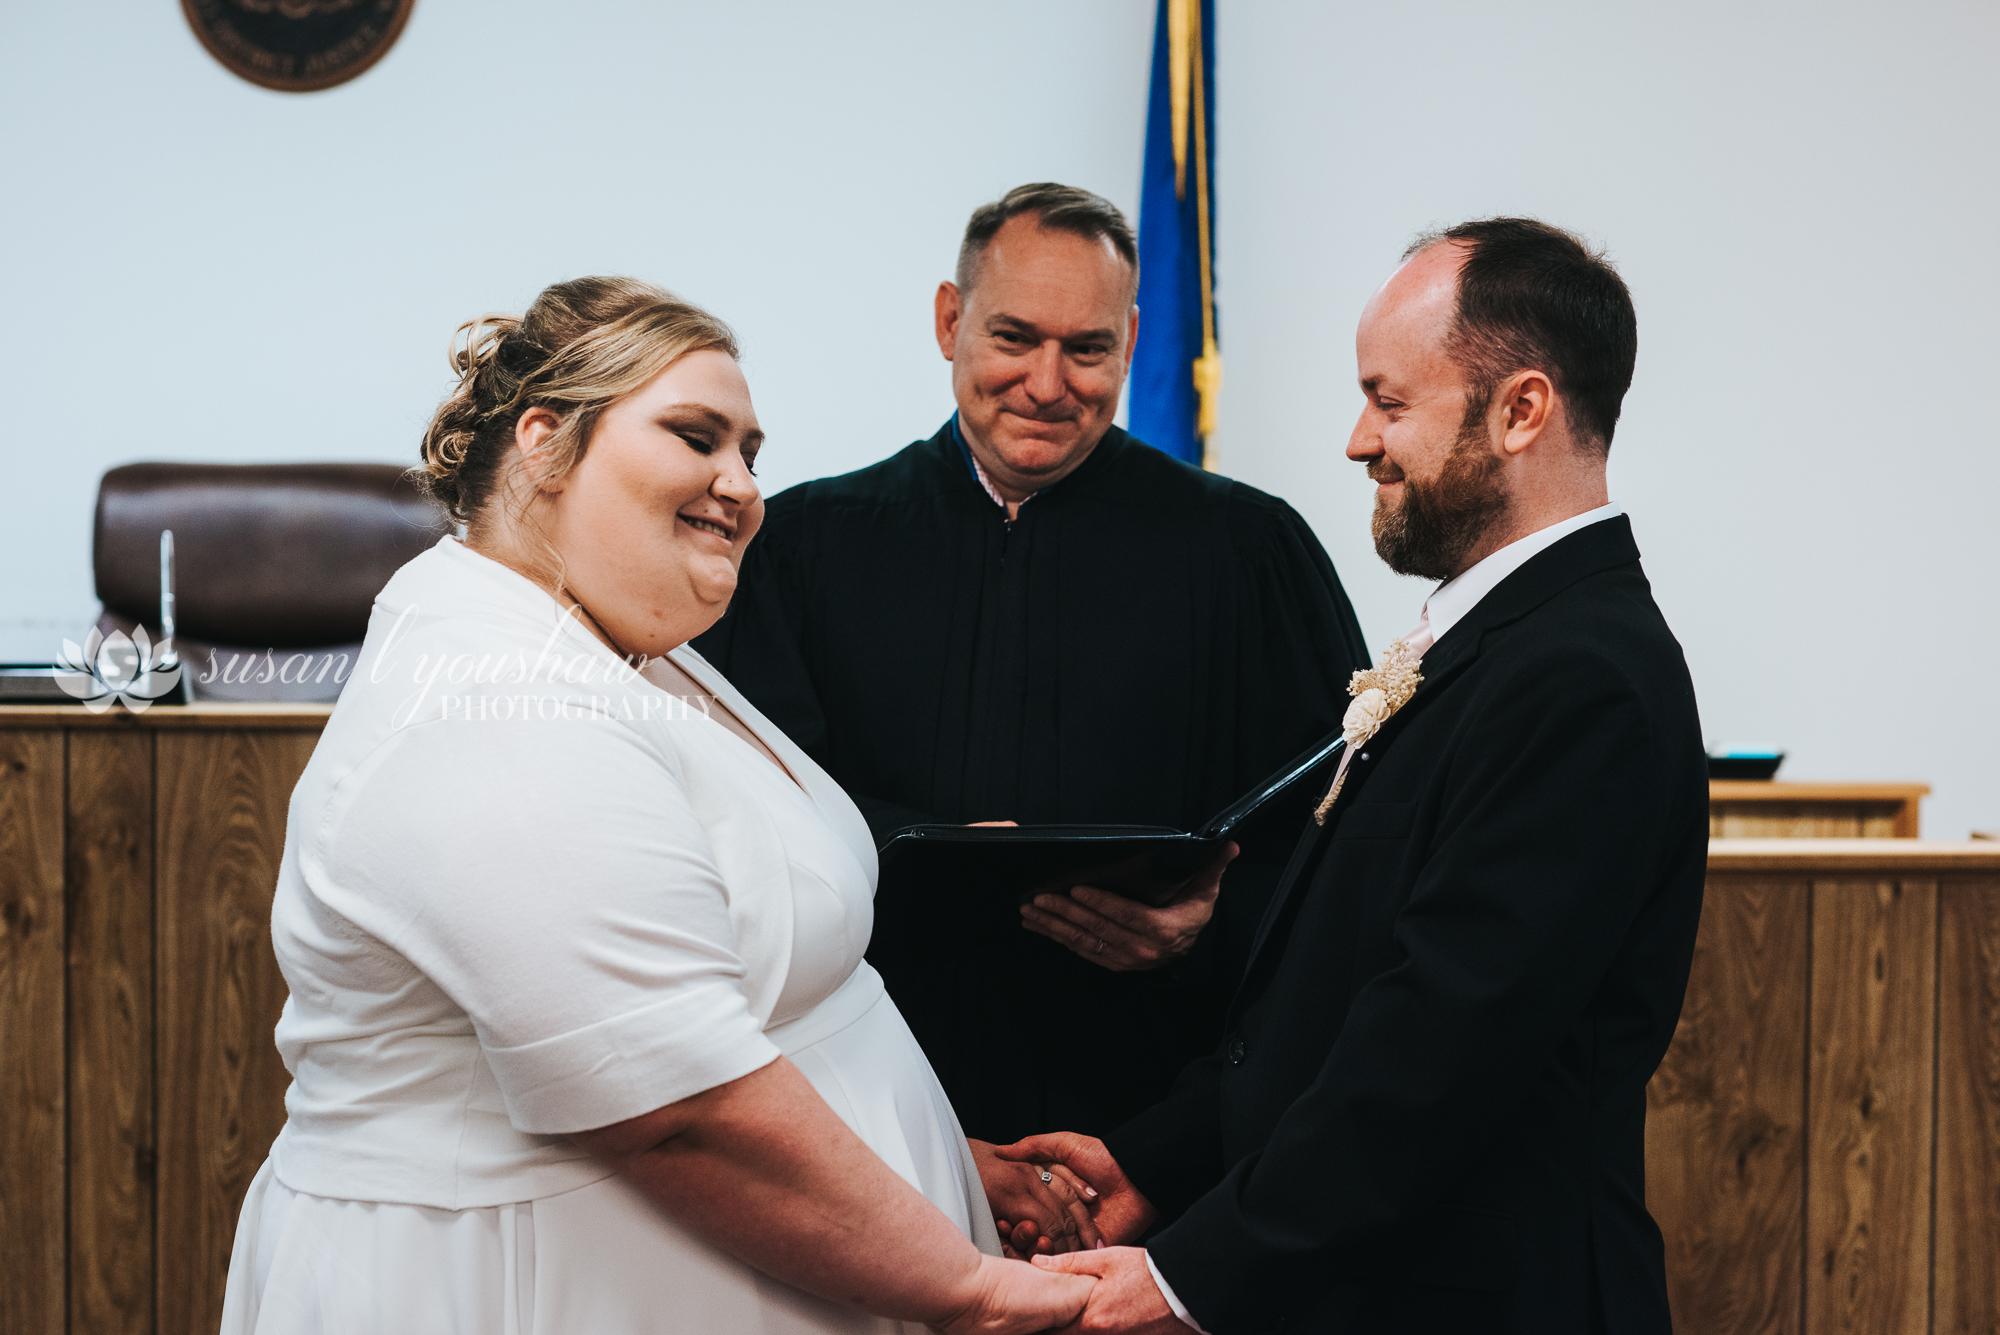 Bill and Sarah Wedding Photos 06-08-2019 SLY Photography -29.jpg